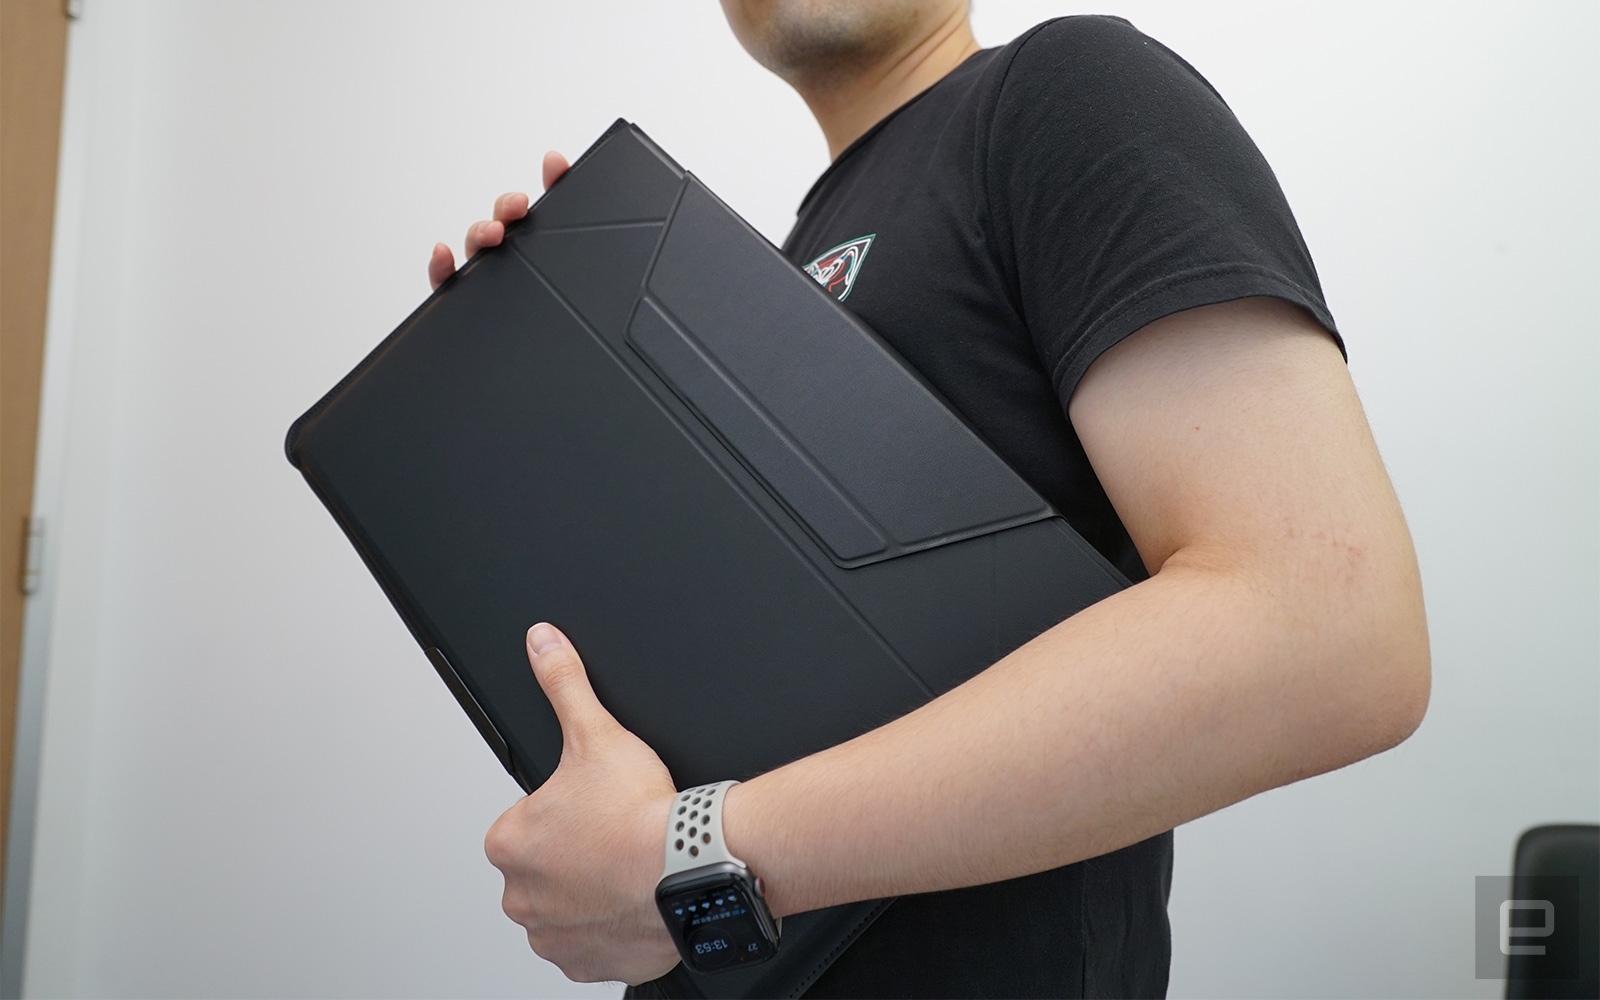 Moft Carry Sleeve